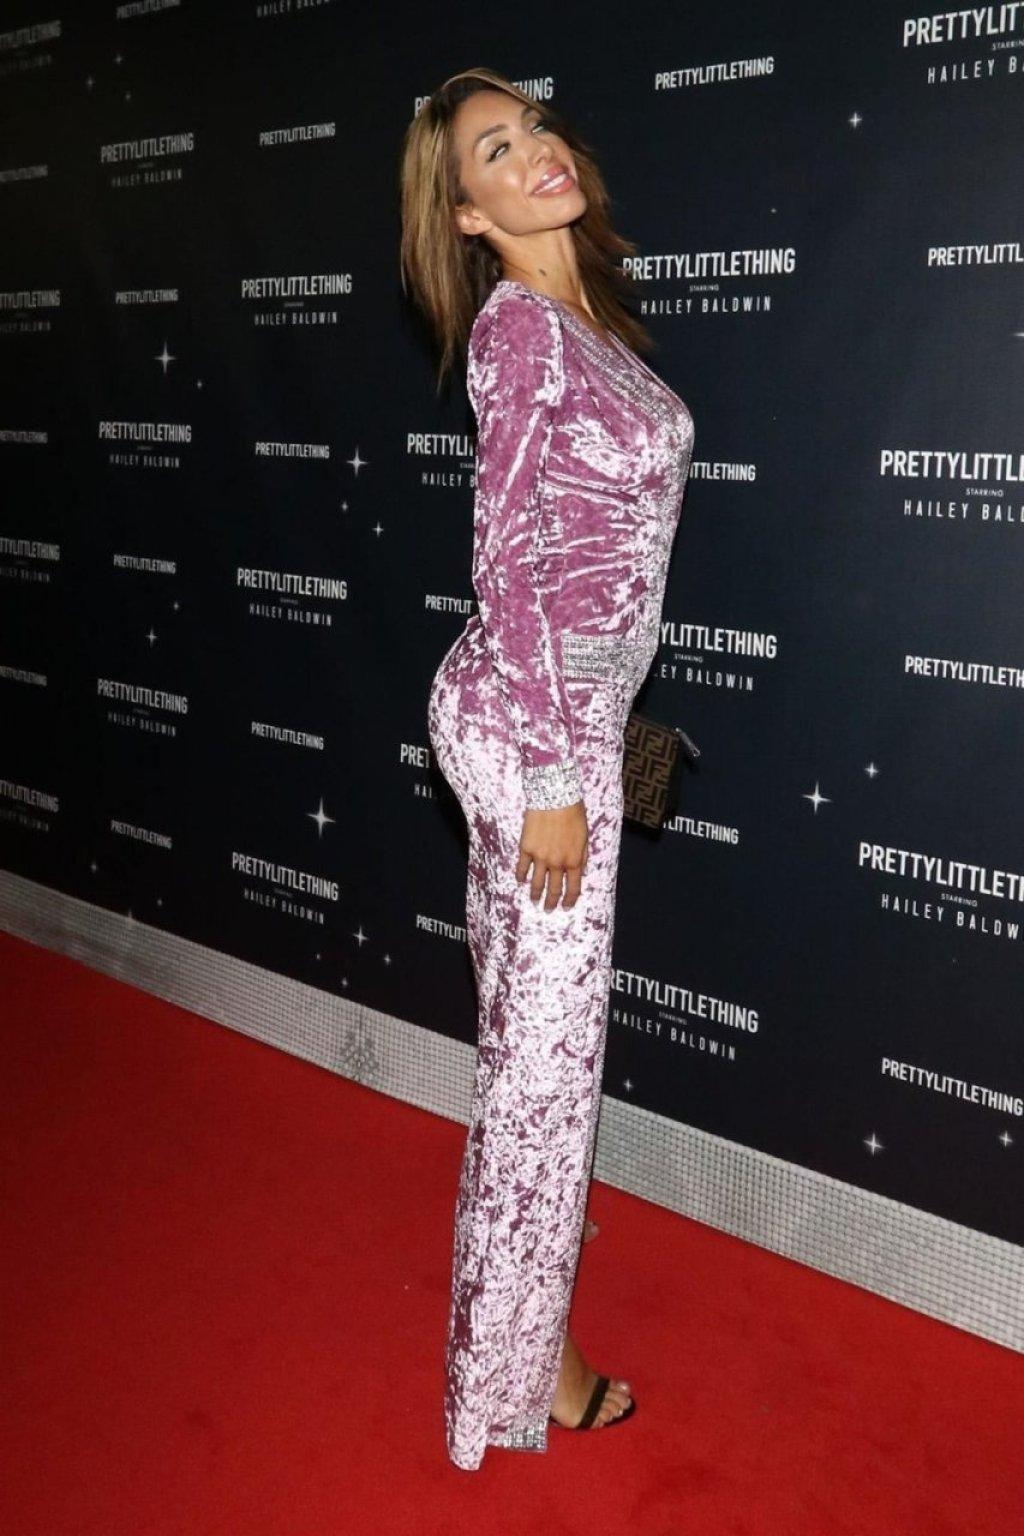 Farrah Abraham Without Underwear (100 Photos)